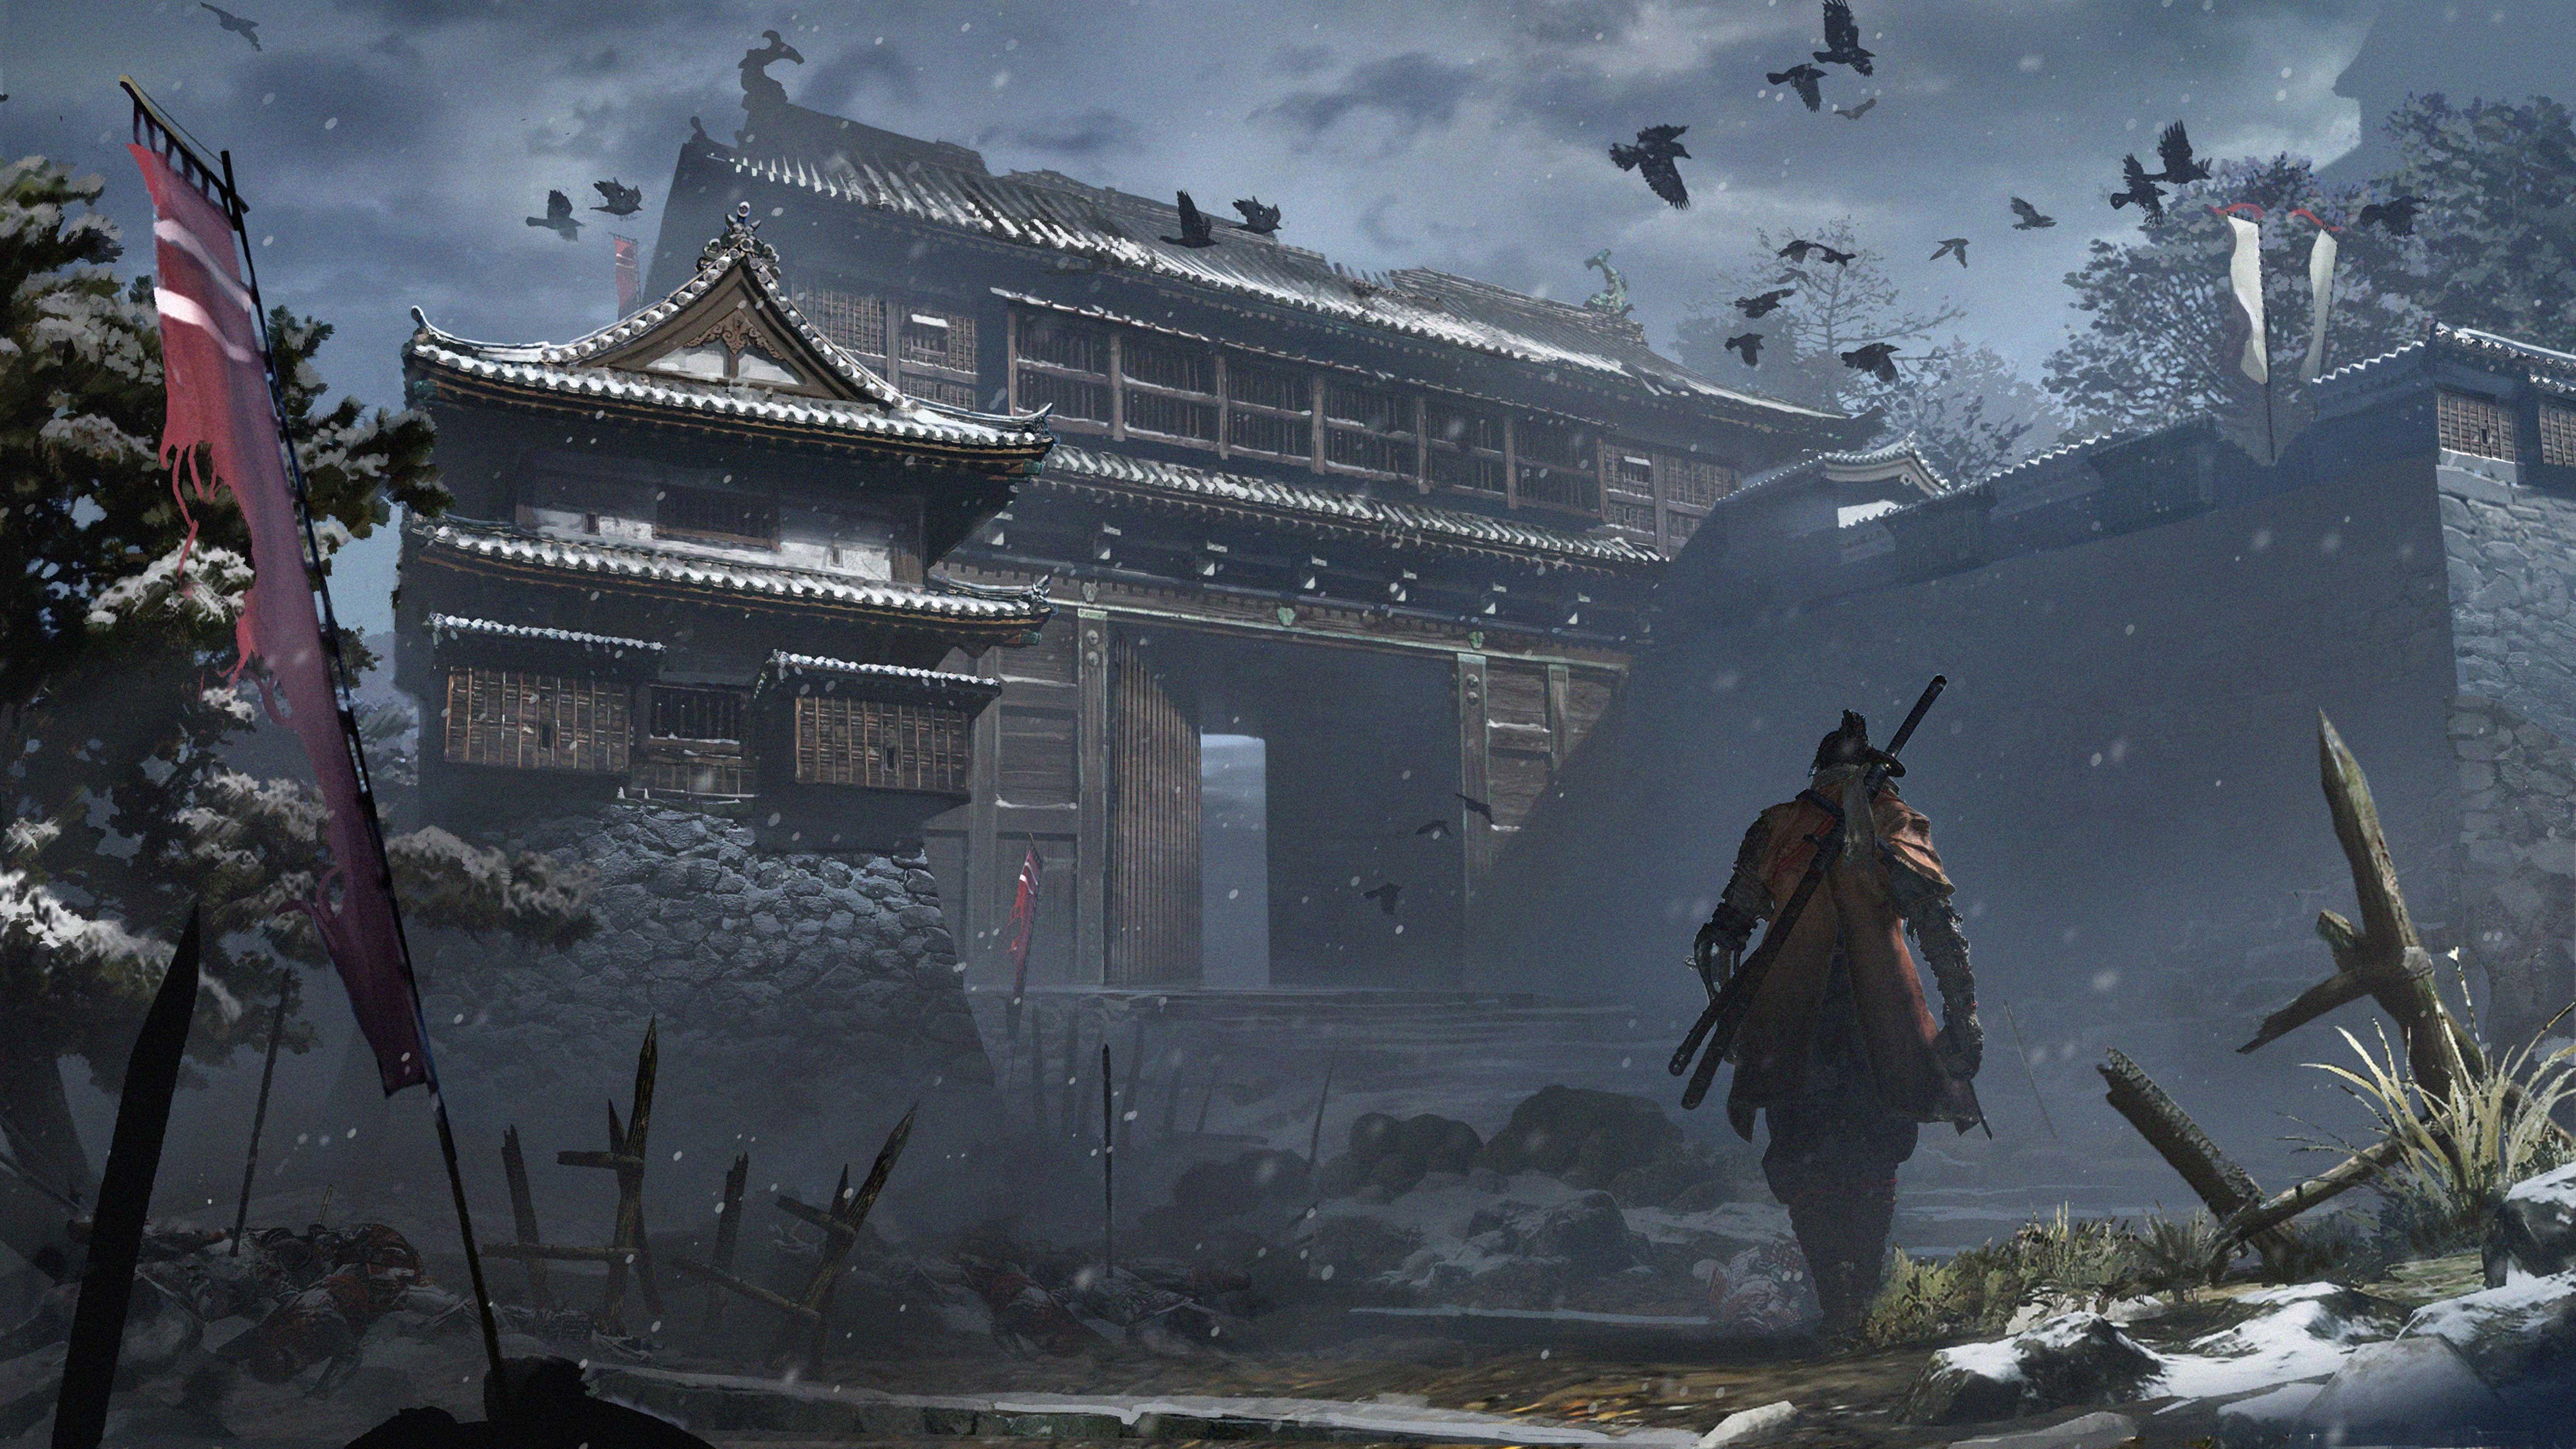 Sekiro Shadows Die Twice Game Official Artwork 5k Hd Games 4k